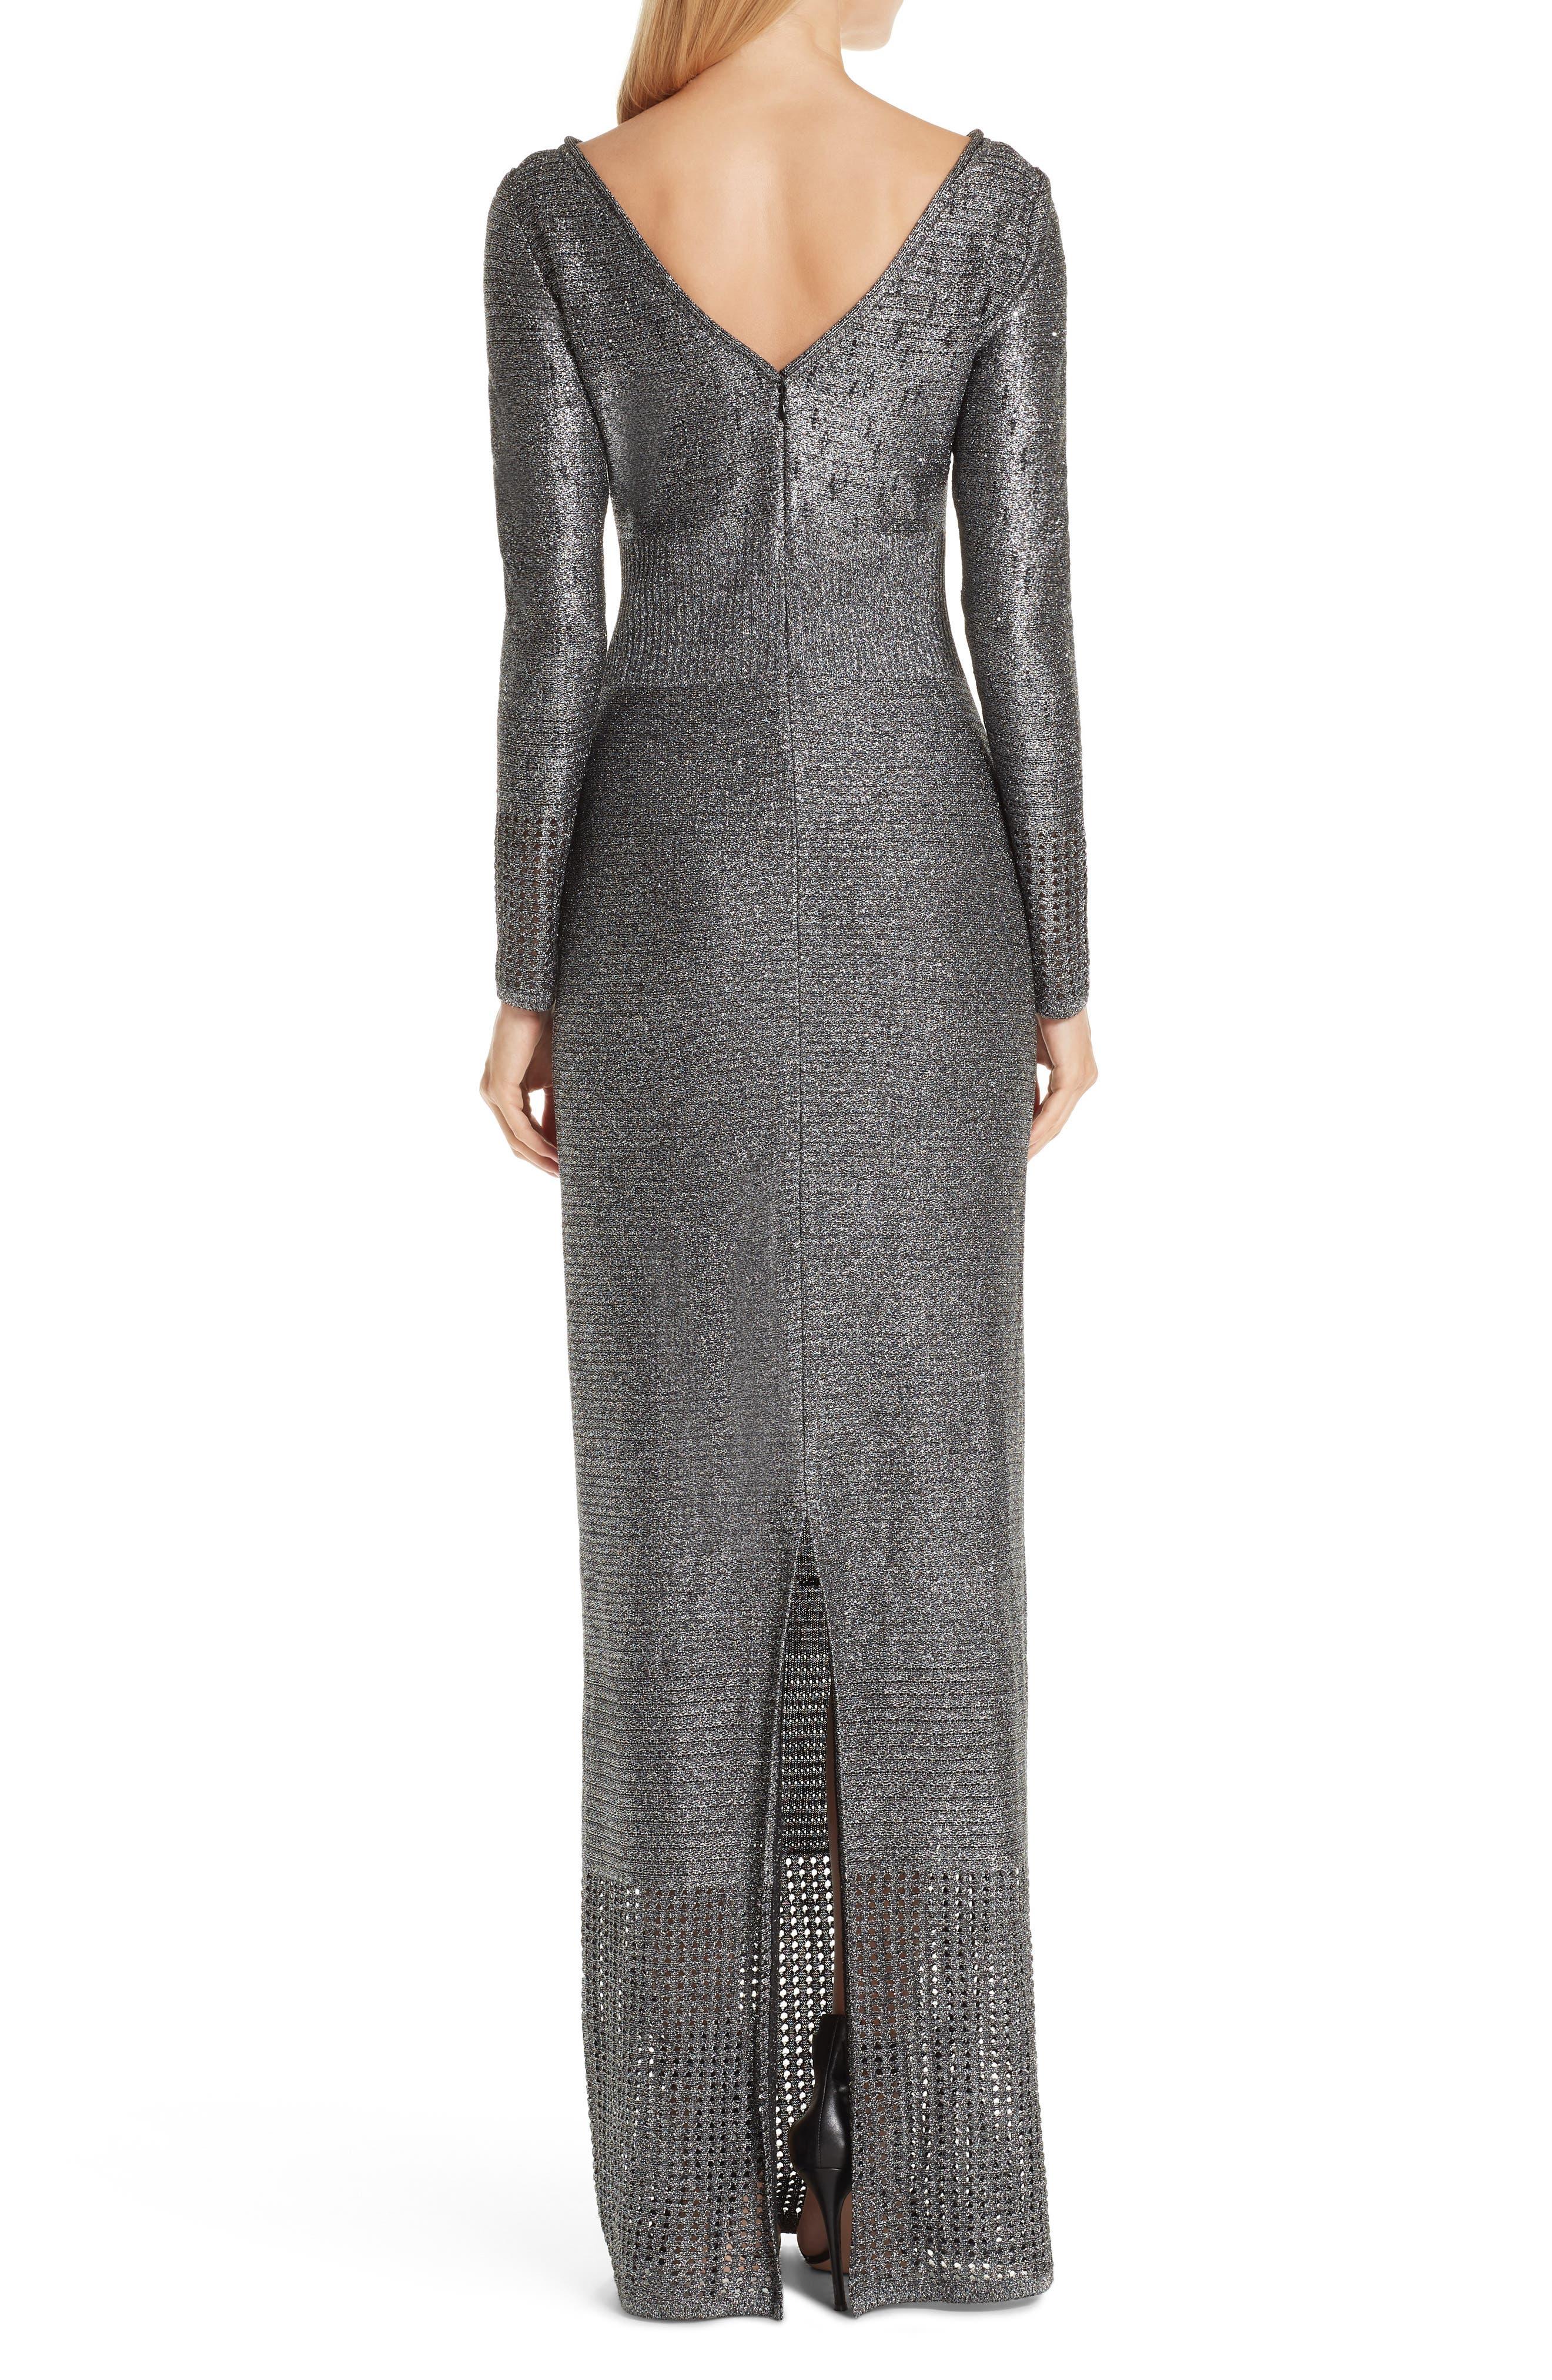 ST. JOHN COLLECTION, Metallic Plaited Mixed Knit Gown, Alternate thumbnail 2, color, GUNMETAL/ CAVIAR